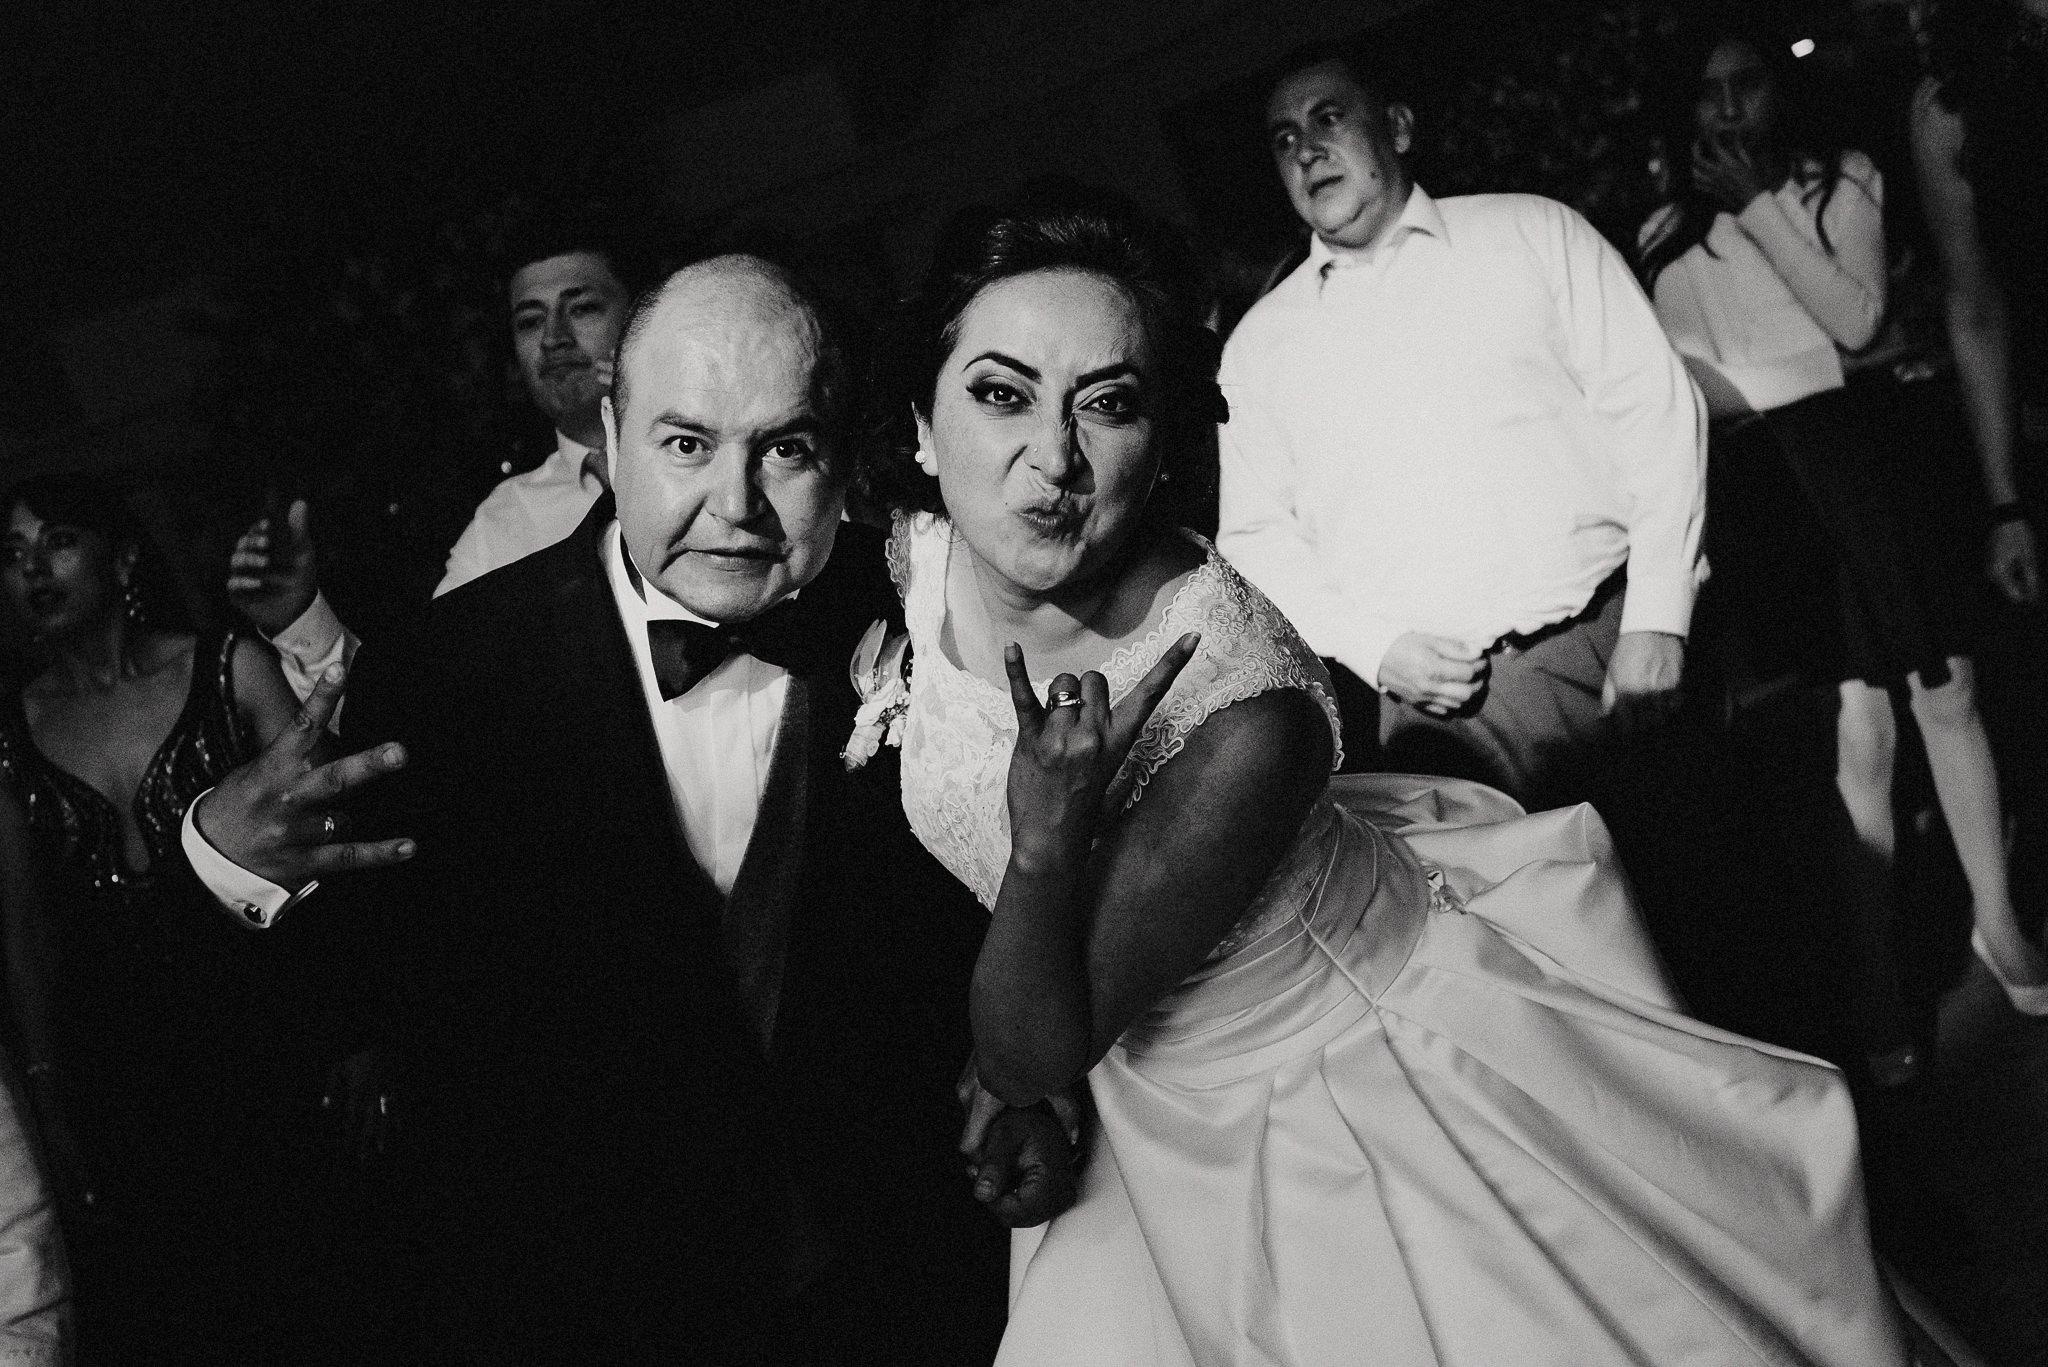 Wedding-Boda-Tulancingo-Hidalgo-Salon-Essenzia-Luis-Houdin-82-film